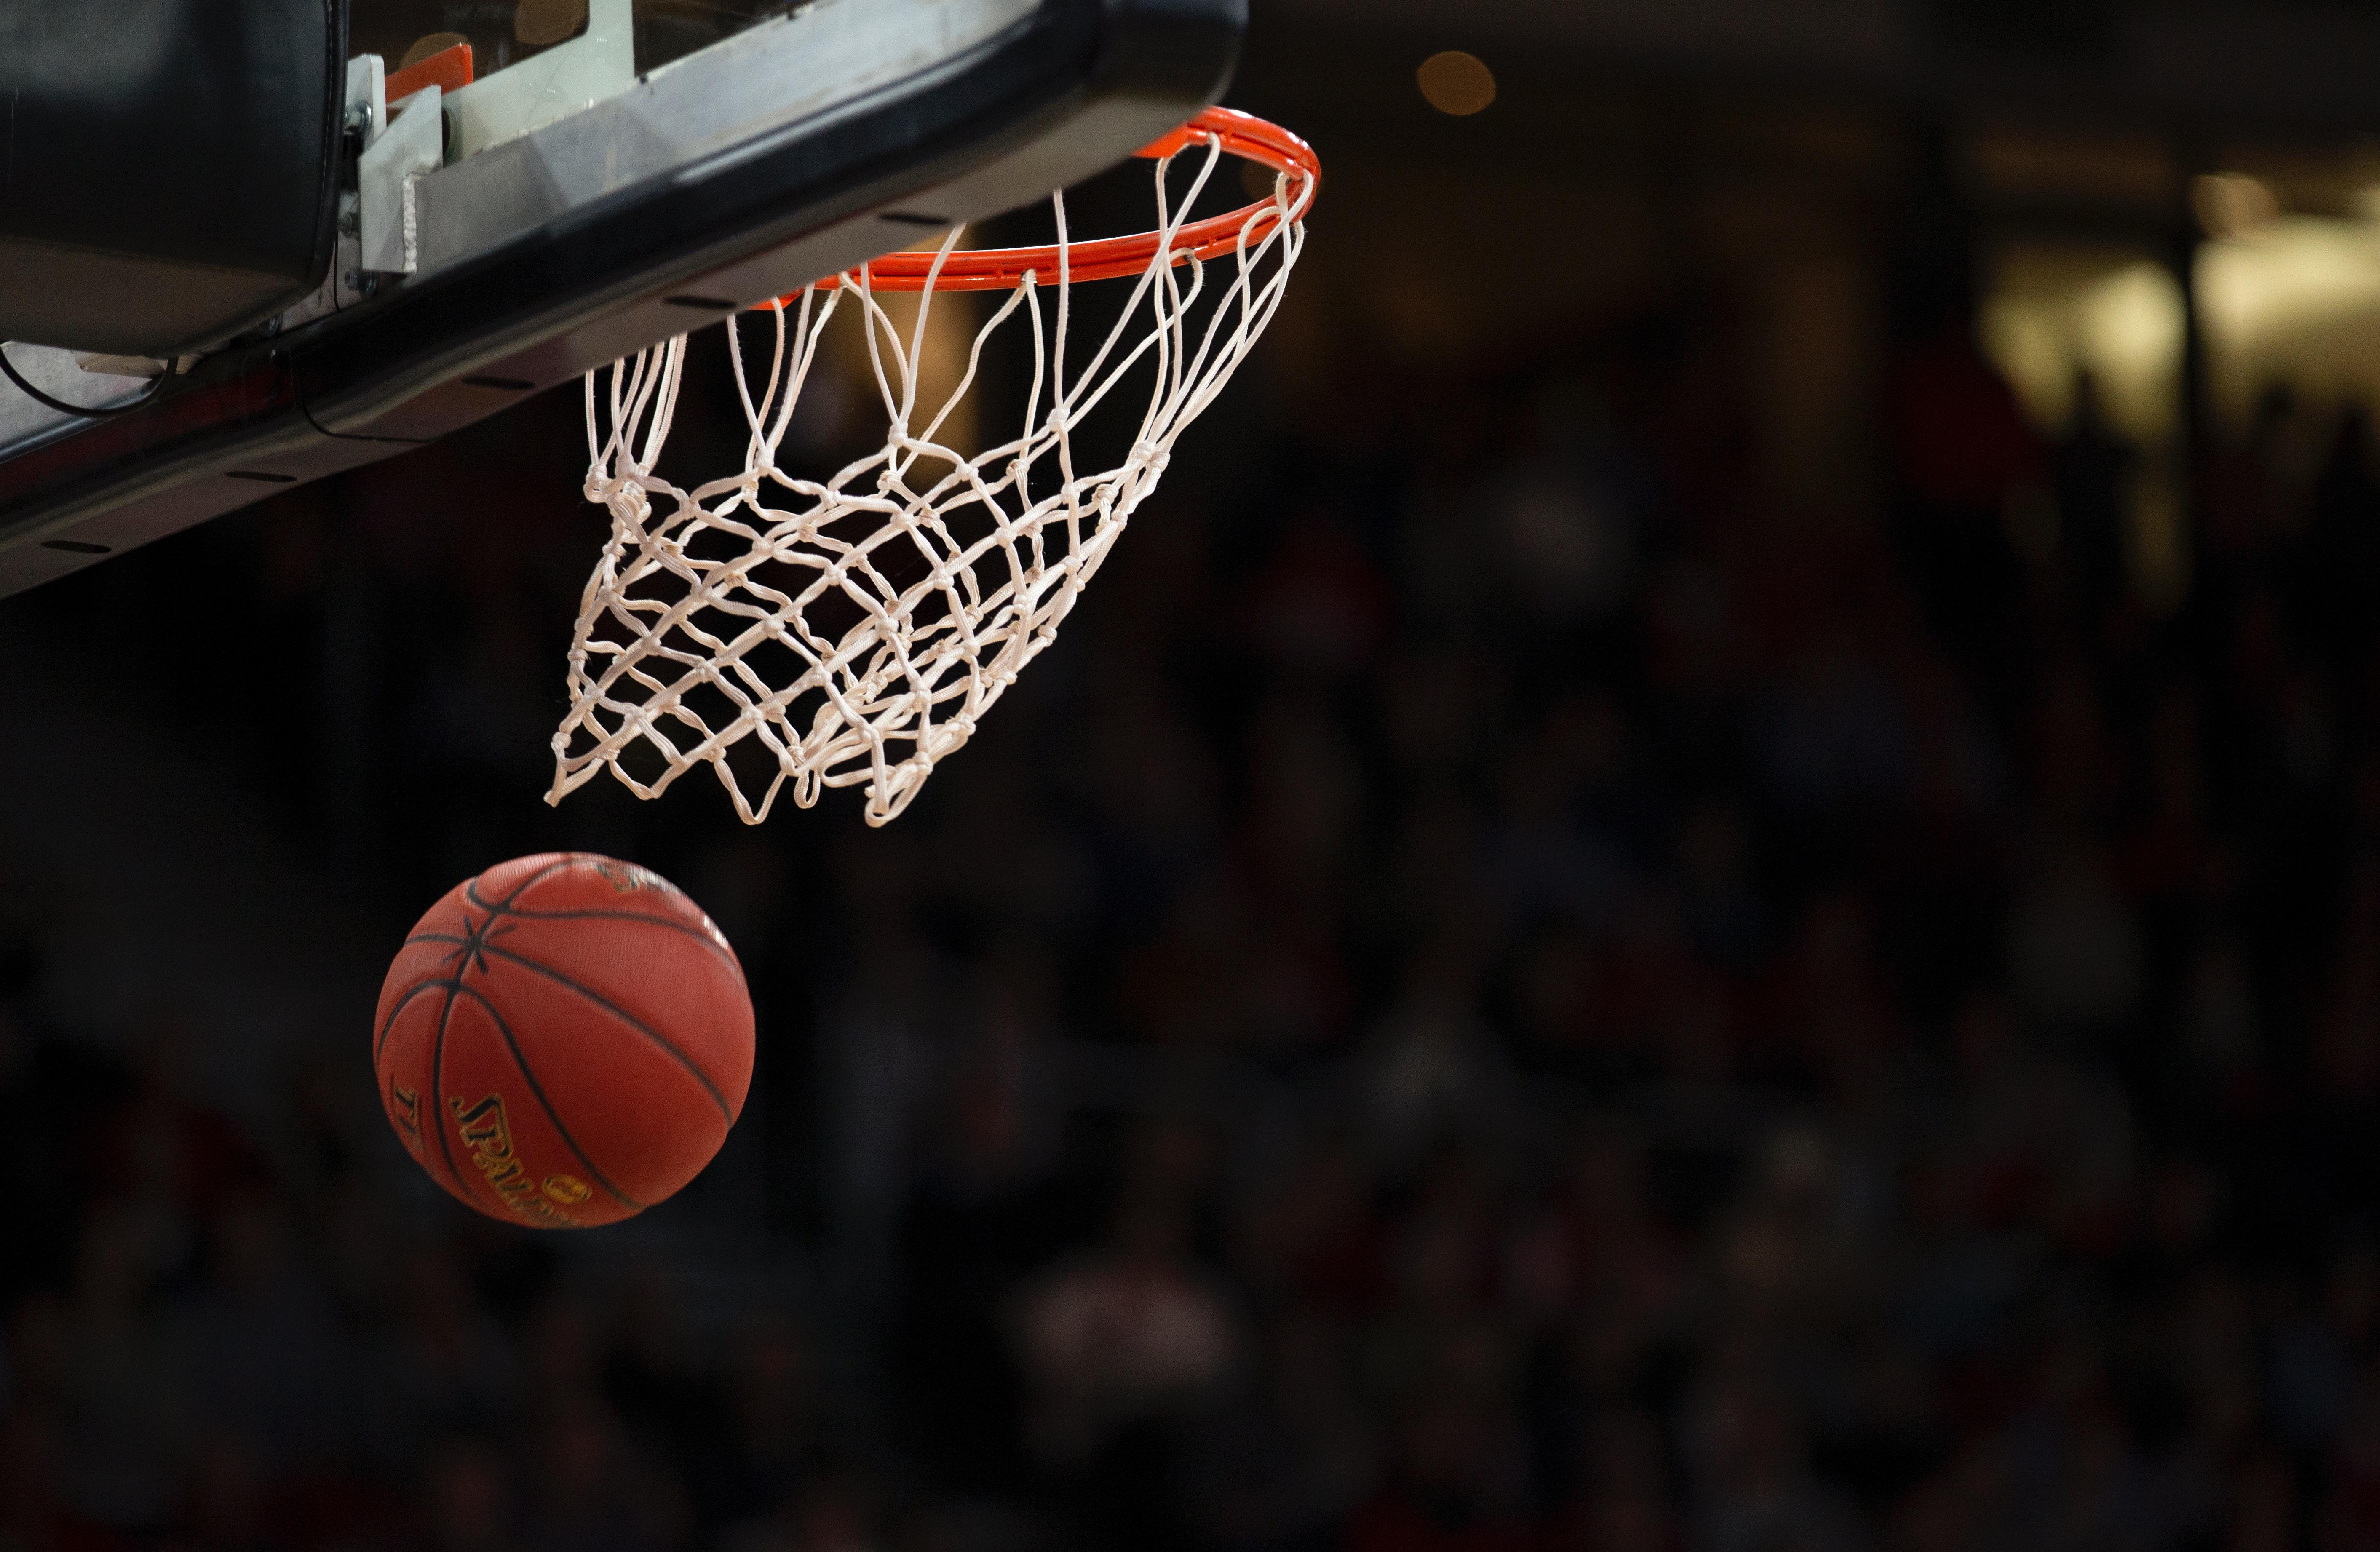 a photo of a basketball net